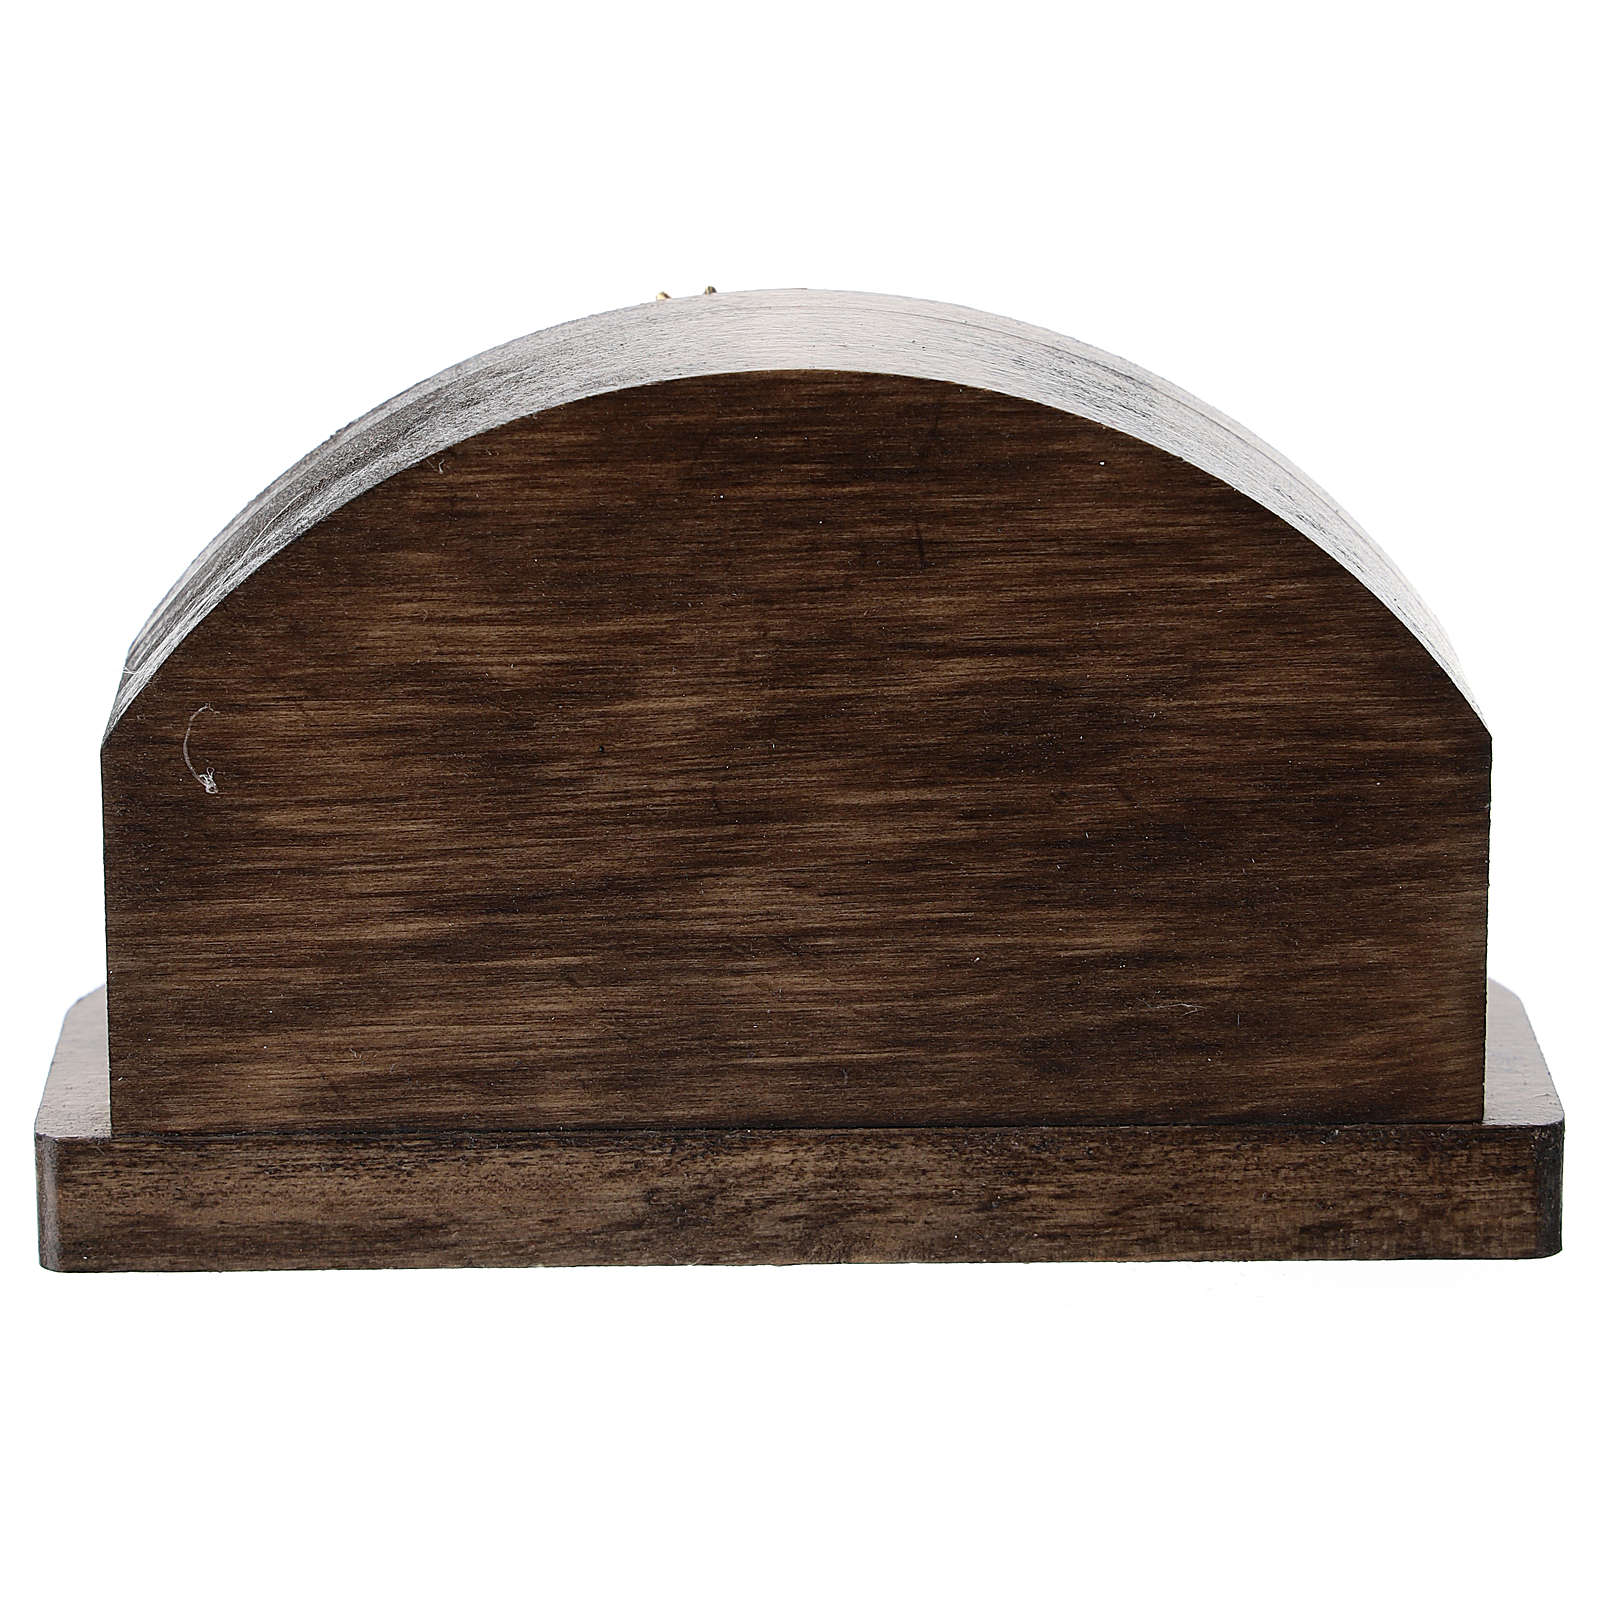 Cabaña madera redonda con Natividad 5 cm metal 3